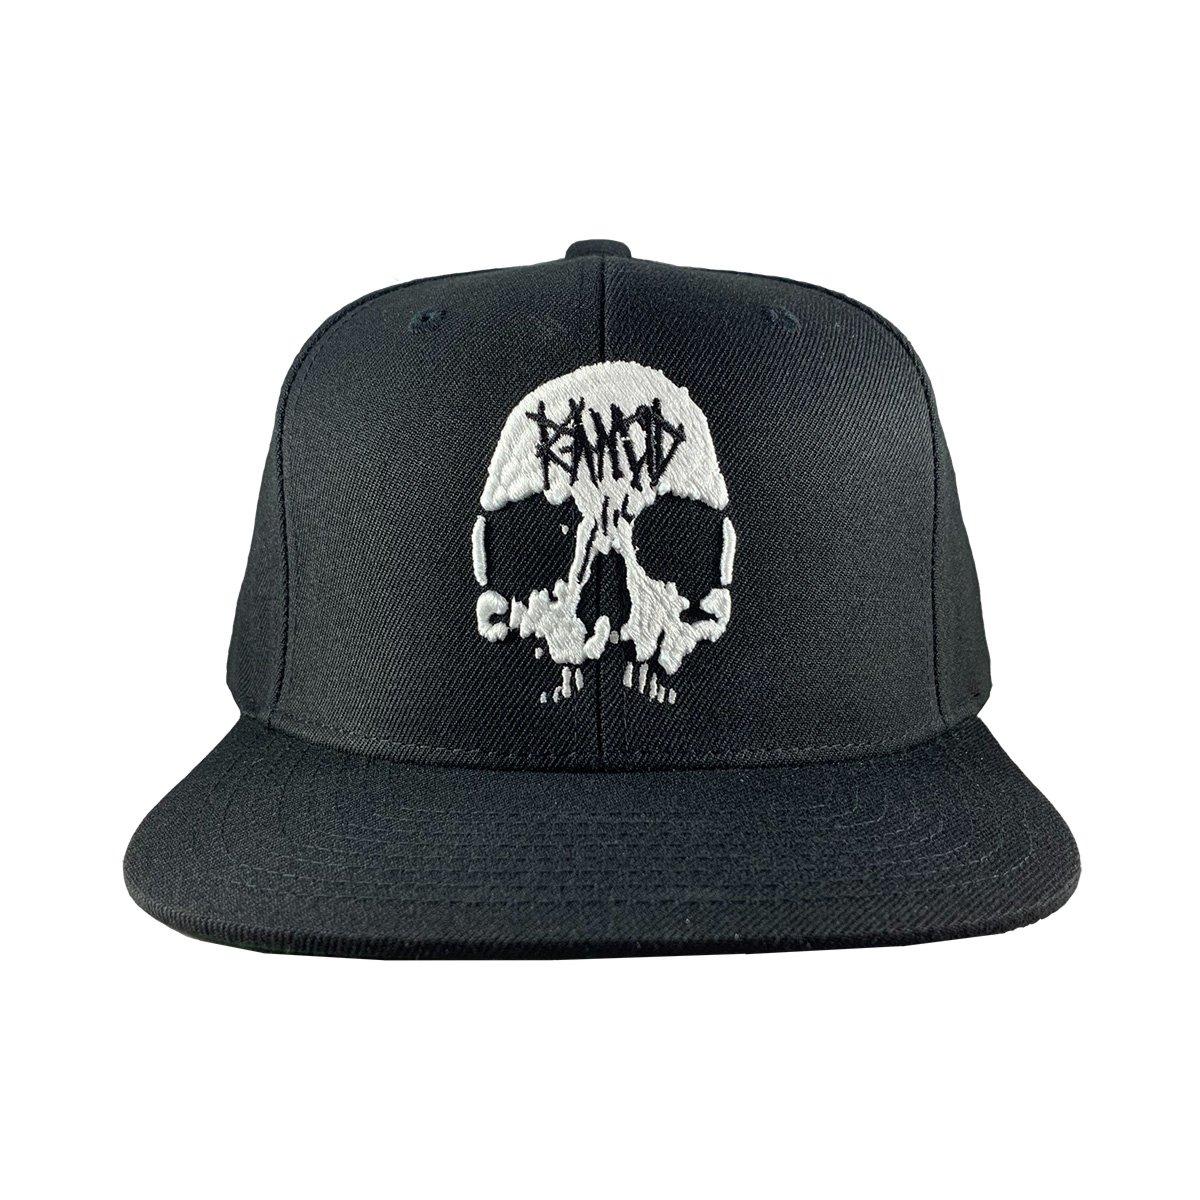 Skull Embroidered Snapback Hat (Black)